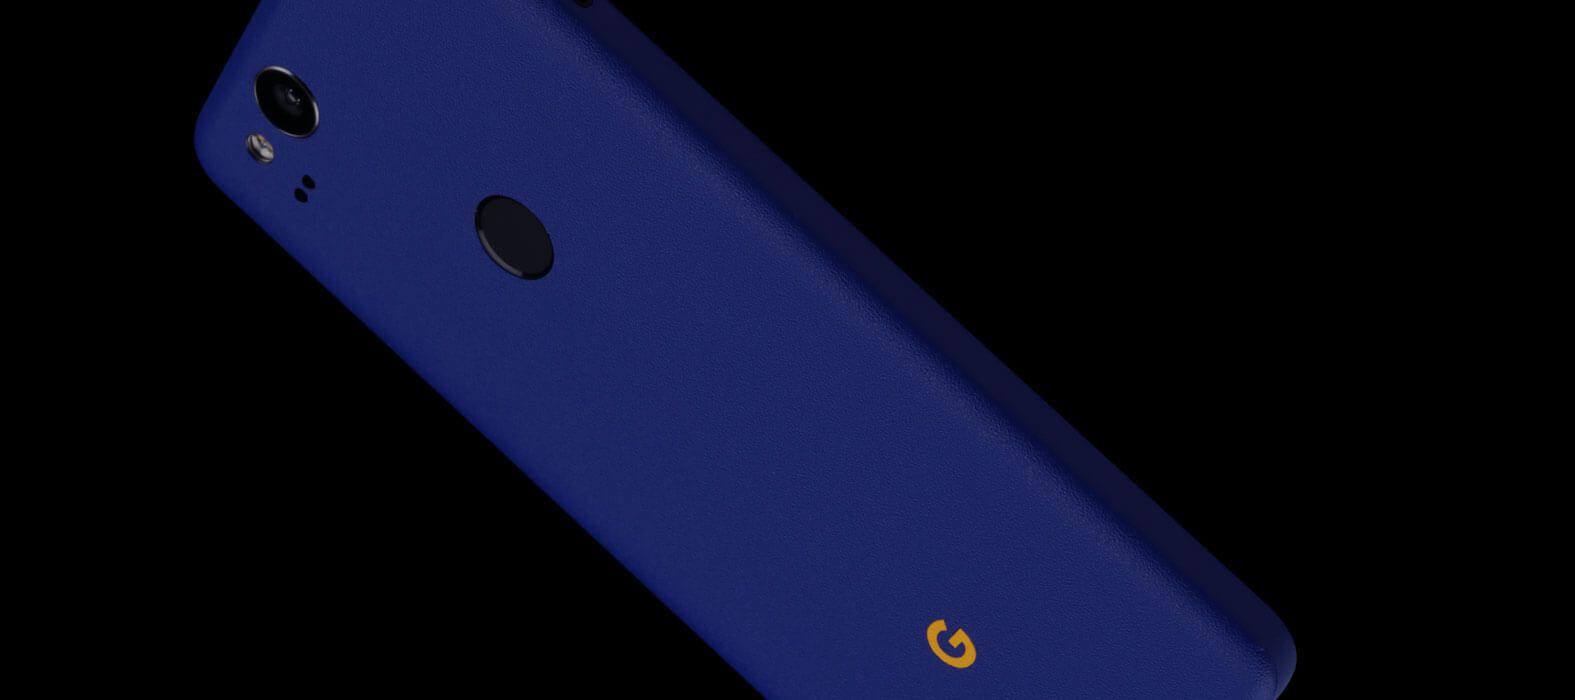 Pixel 2 Wraps, Skins, Decals - Sandstone Blue